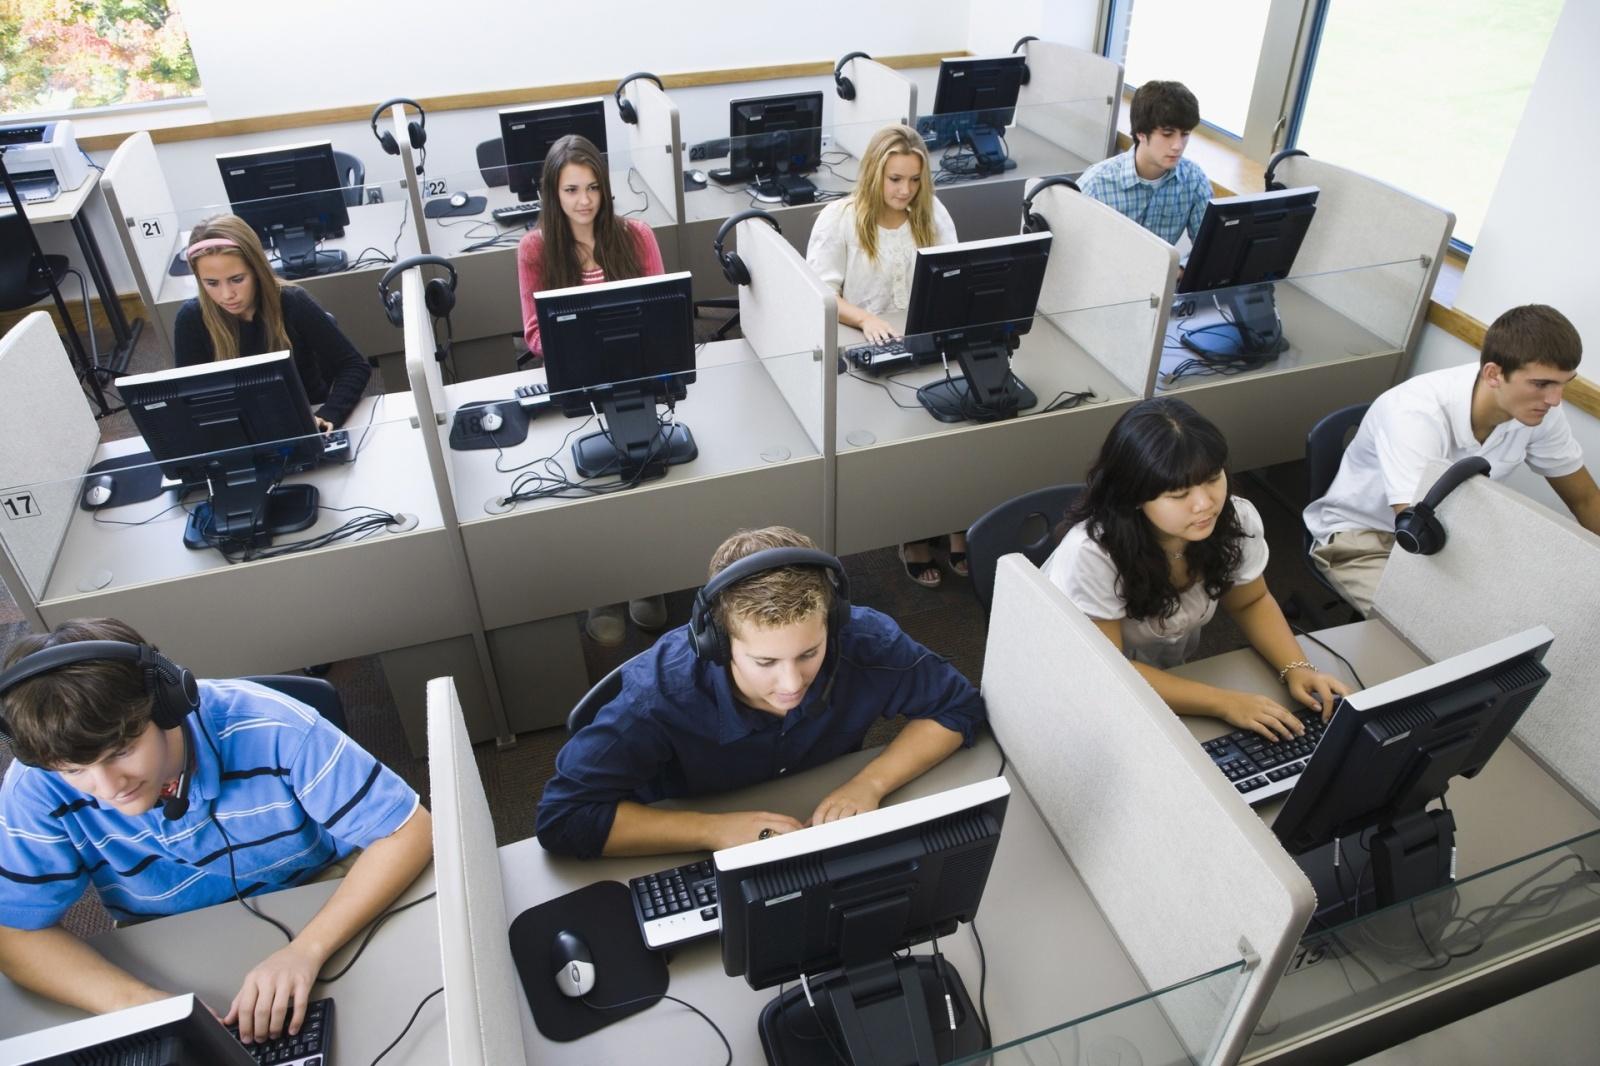 Teachbase на конференции Intel: помогаем учителям учиться - 1